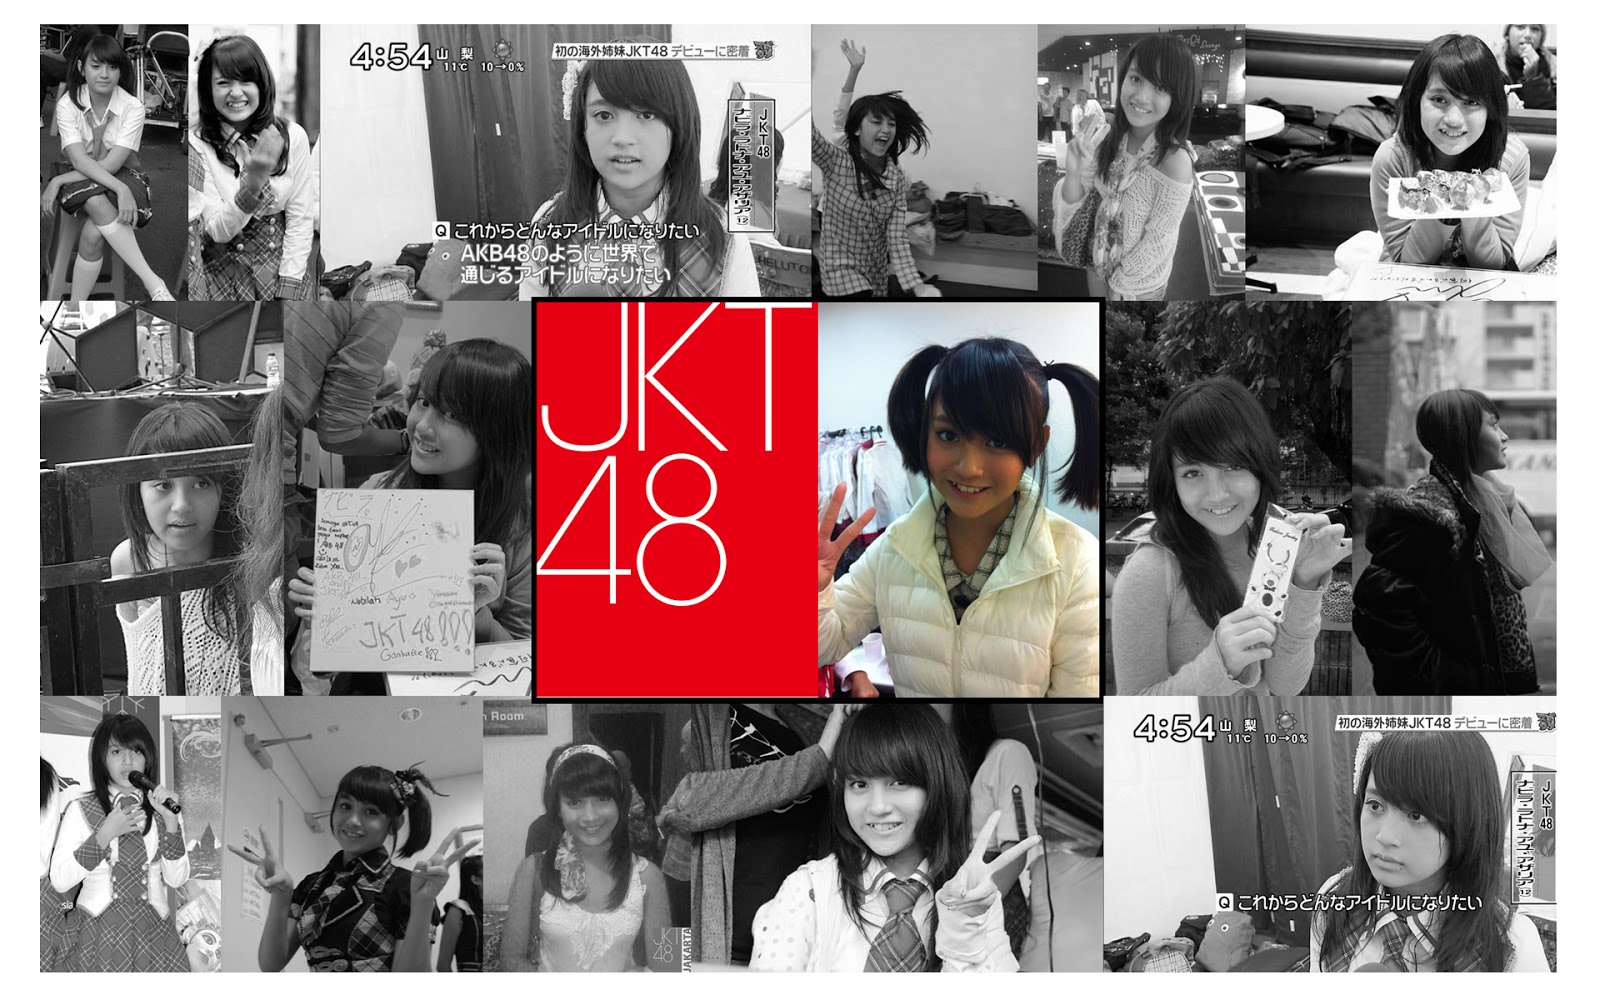 Wallpaper HD nabilah JKT48  Nabilah Jkt48 Wallpaper